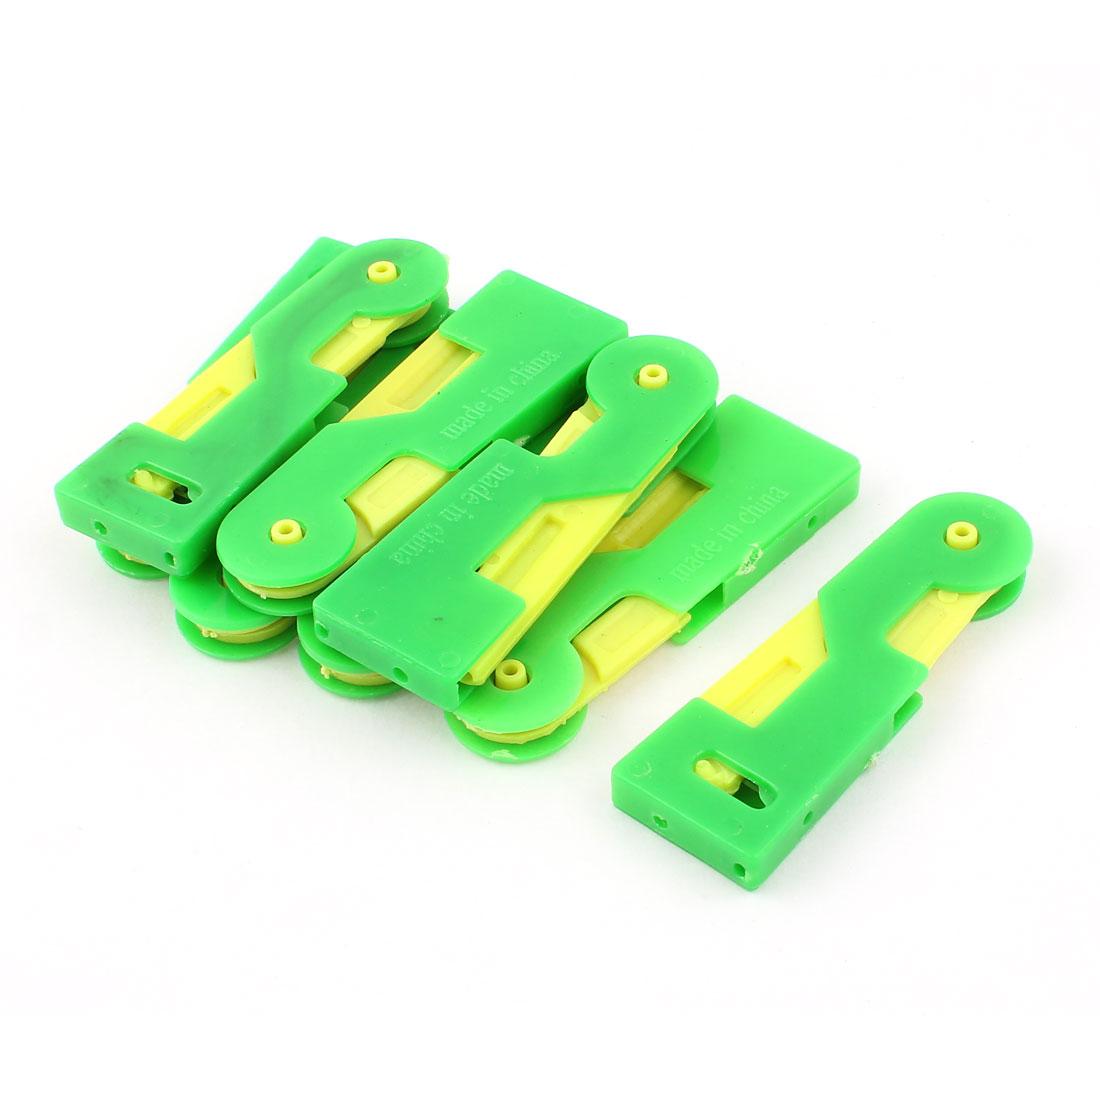 Elder Stitch Sew Hem Automatic Needle Threader Thread Guide Green Yellow 8pcs